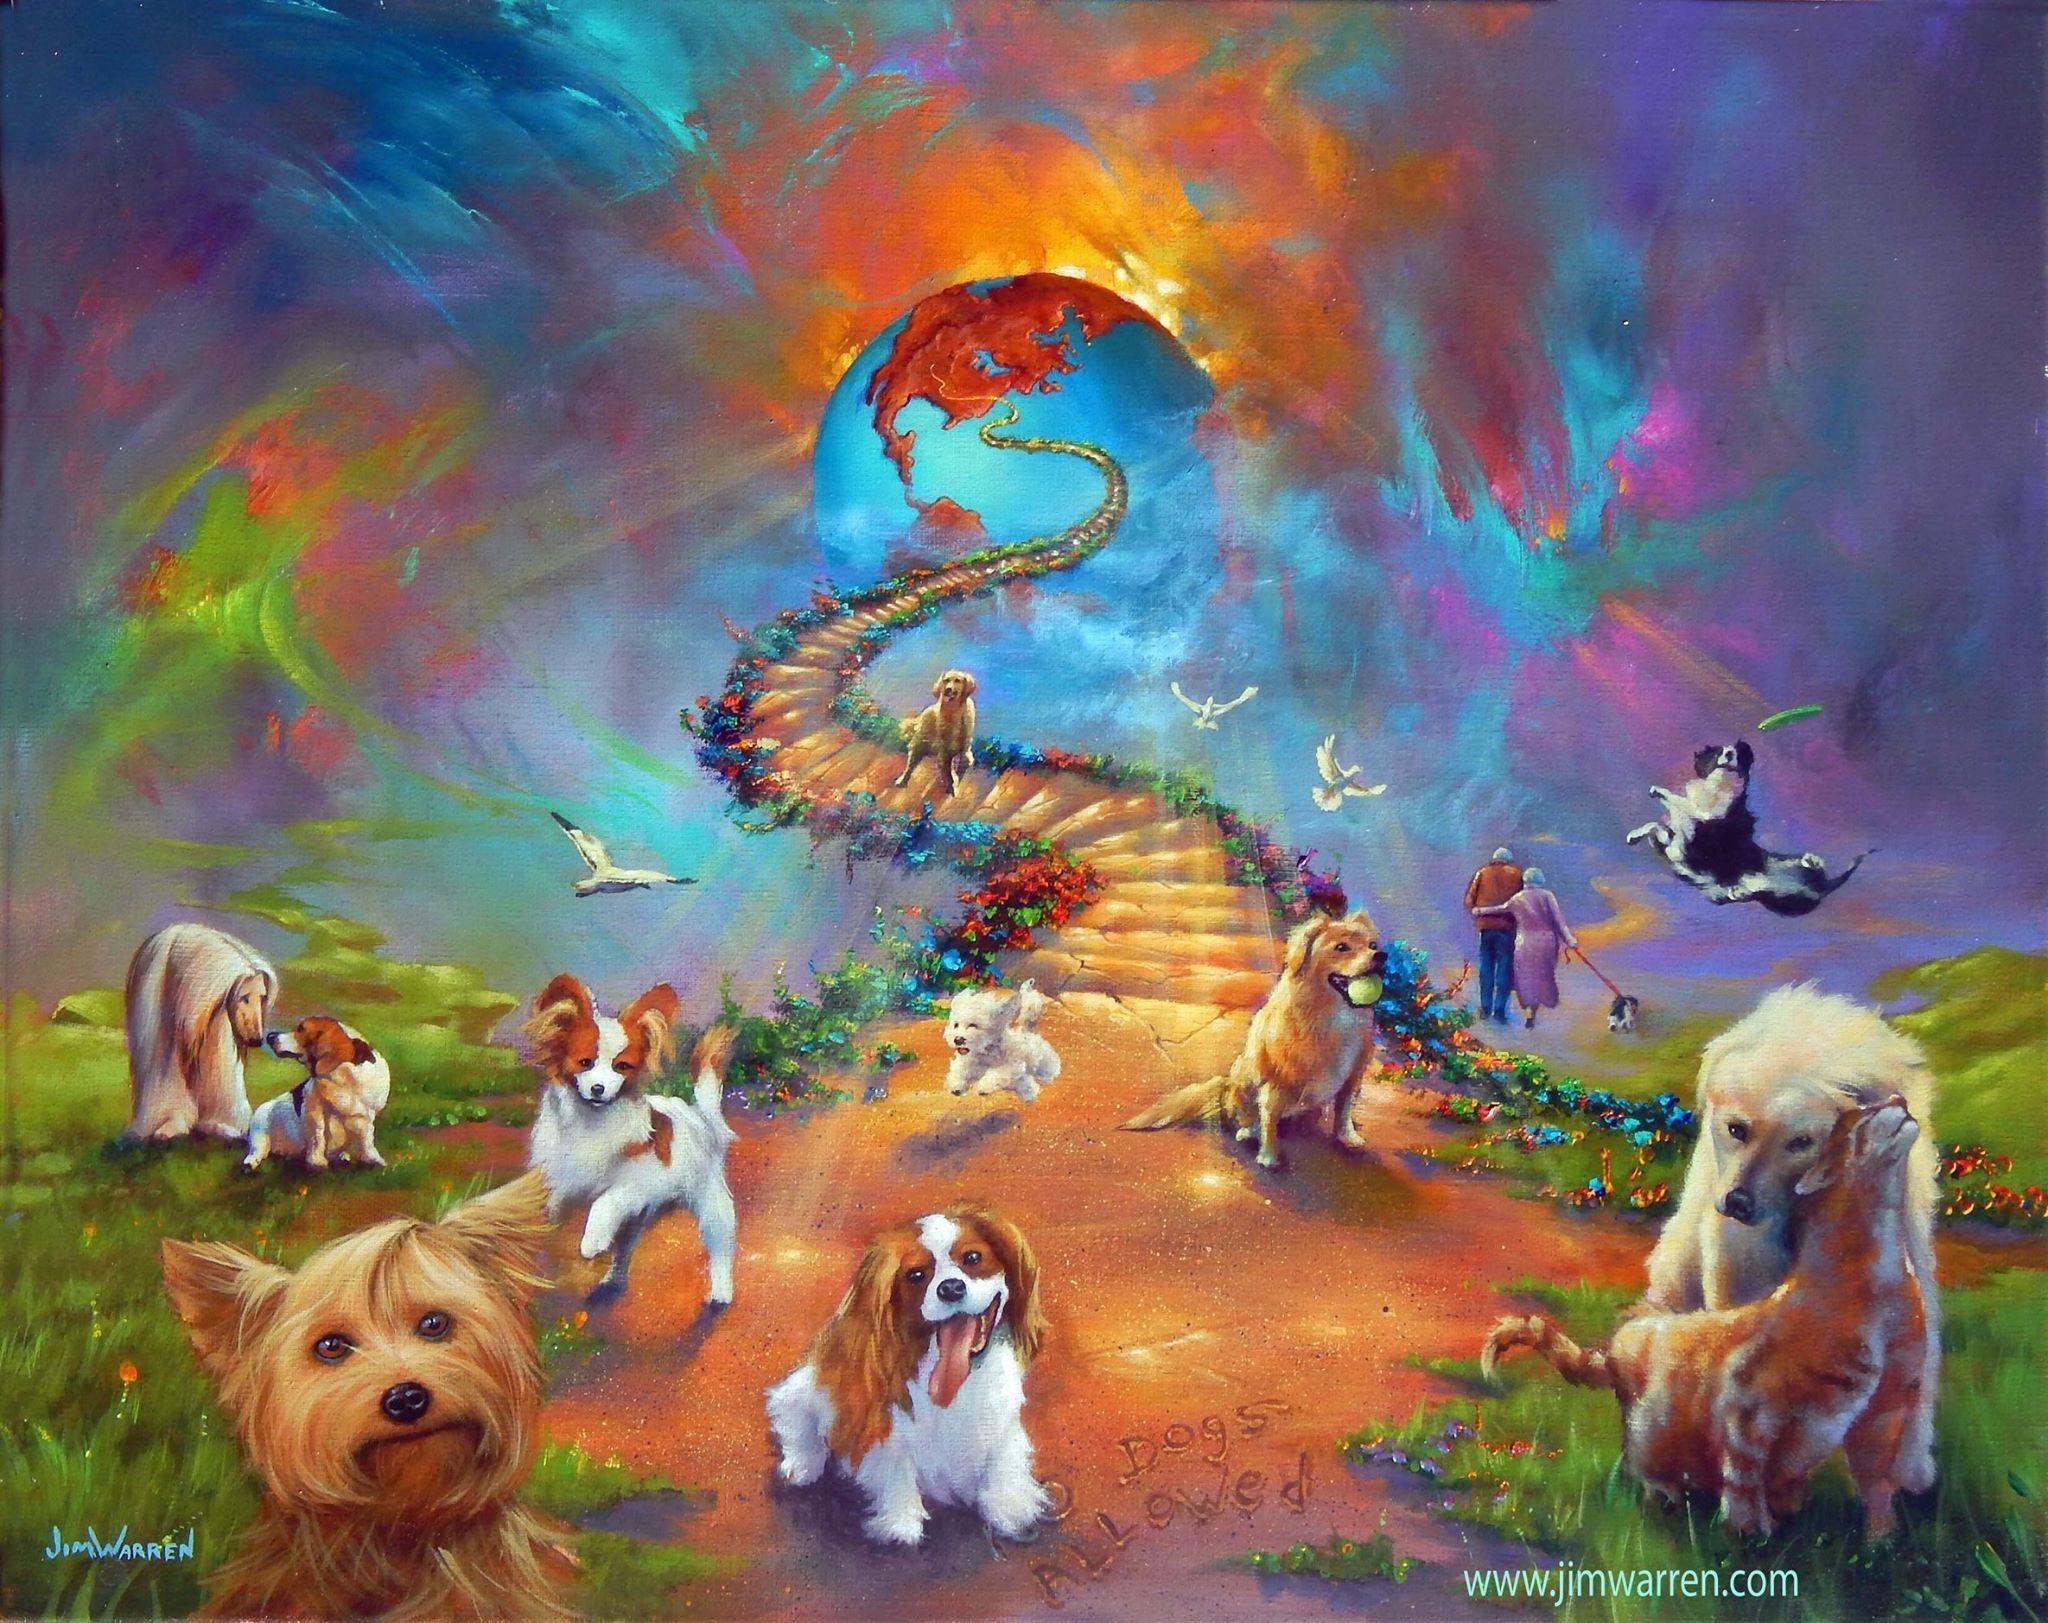 All Dogs Go To Heaven 4 Cross Paintings 8x10 Art Prints Rainbow Bridge